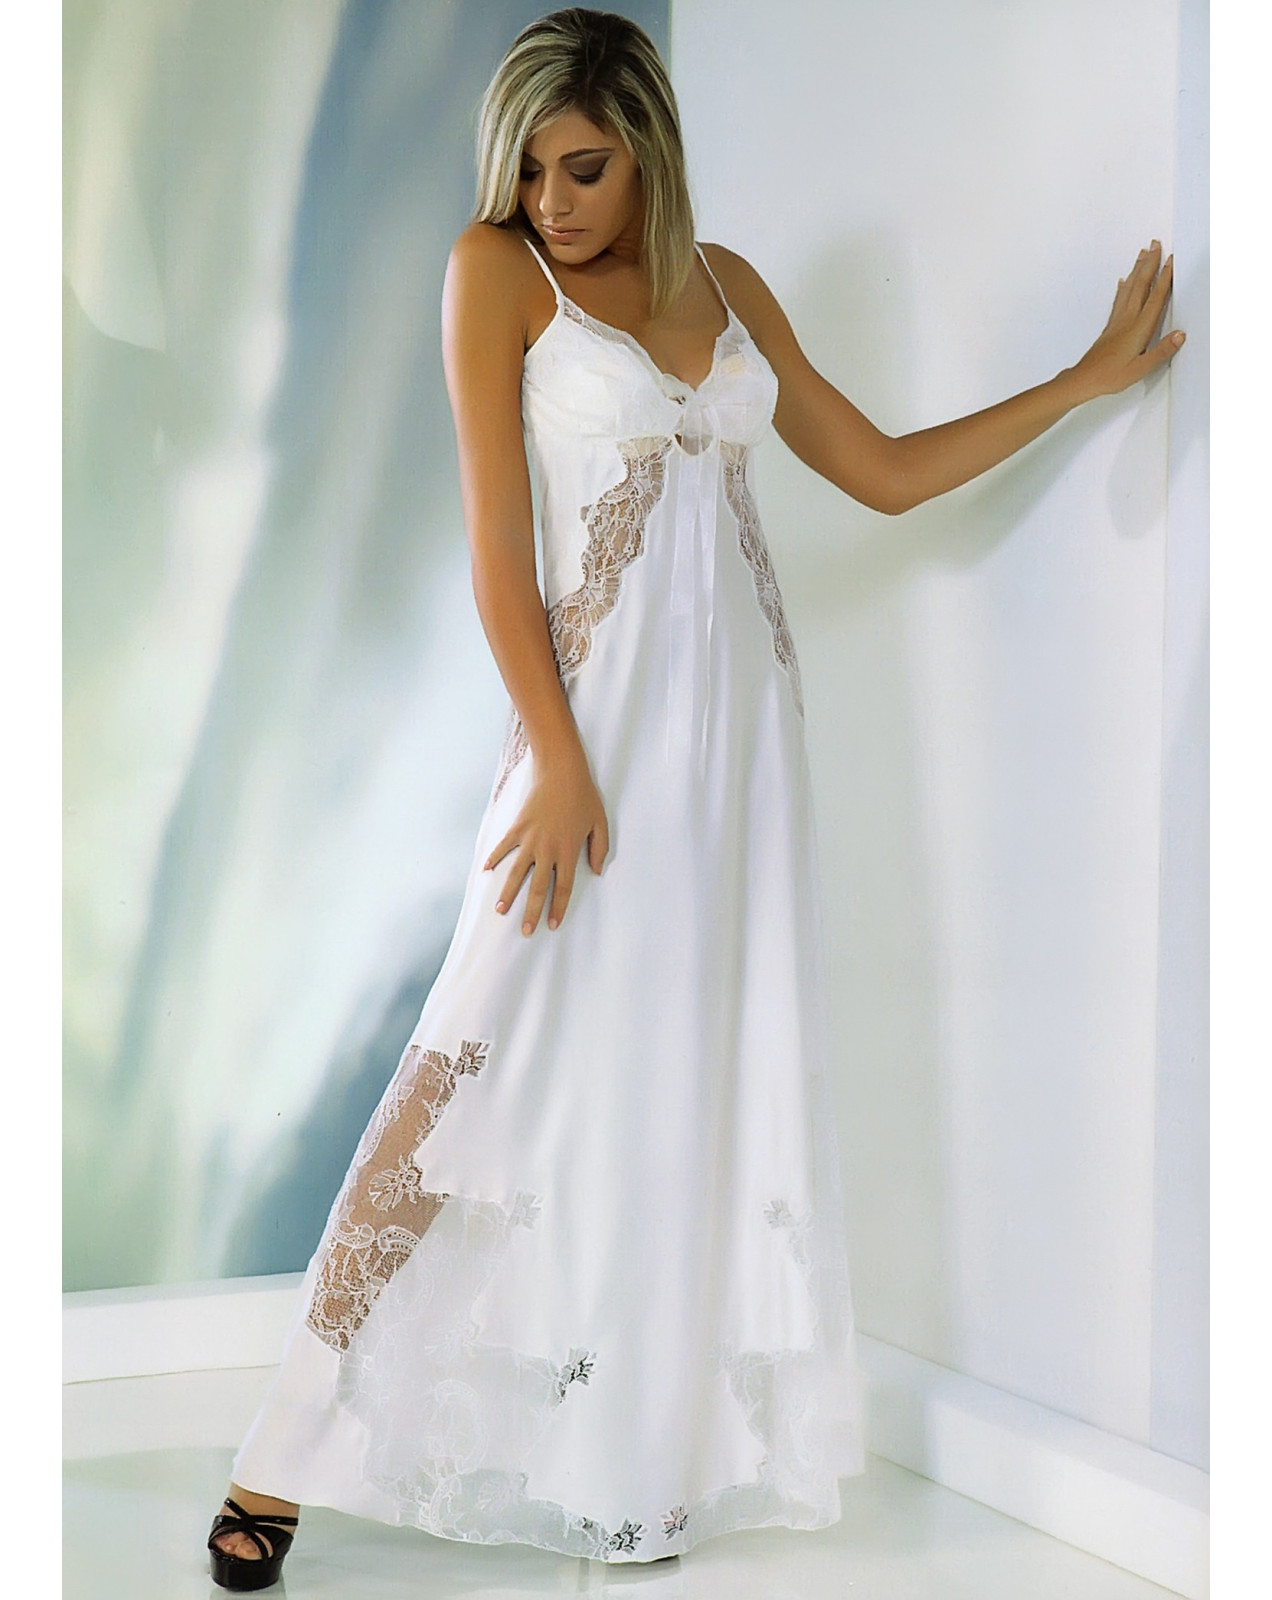 Thesan nightgown